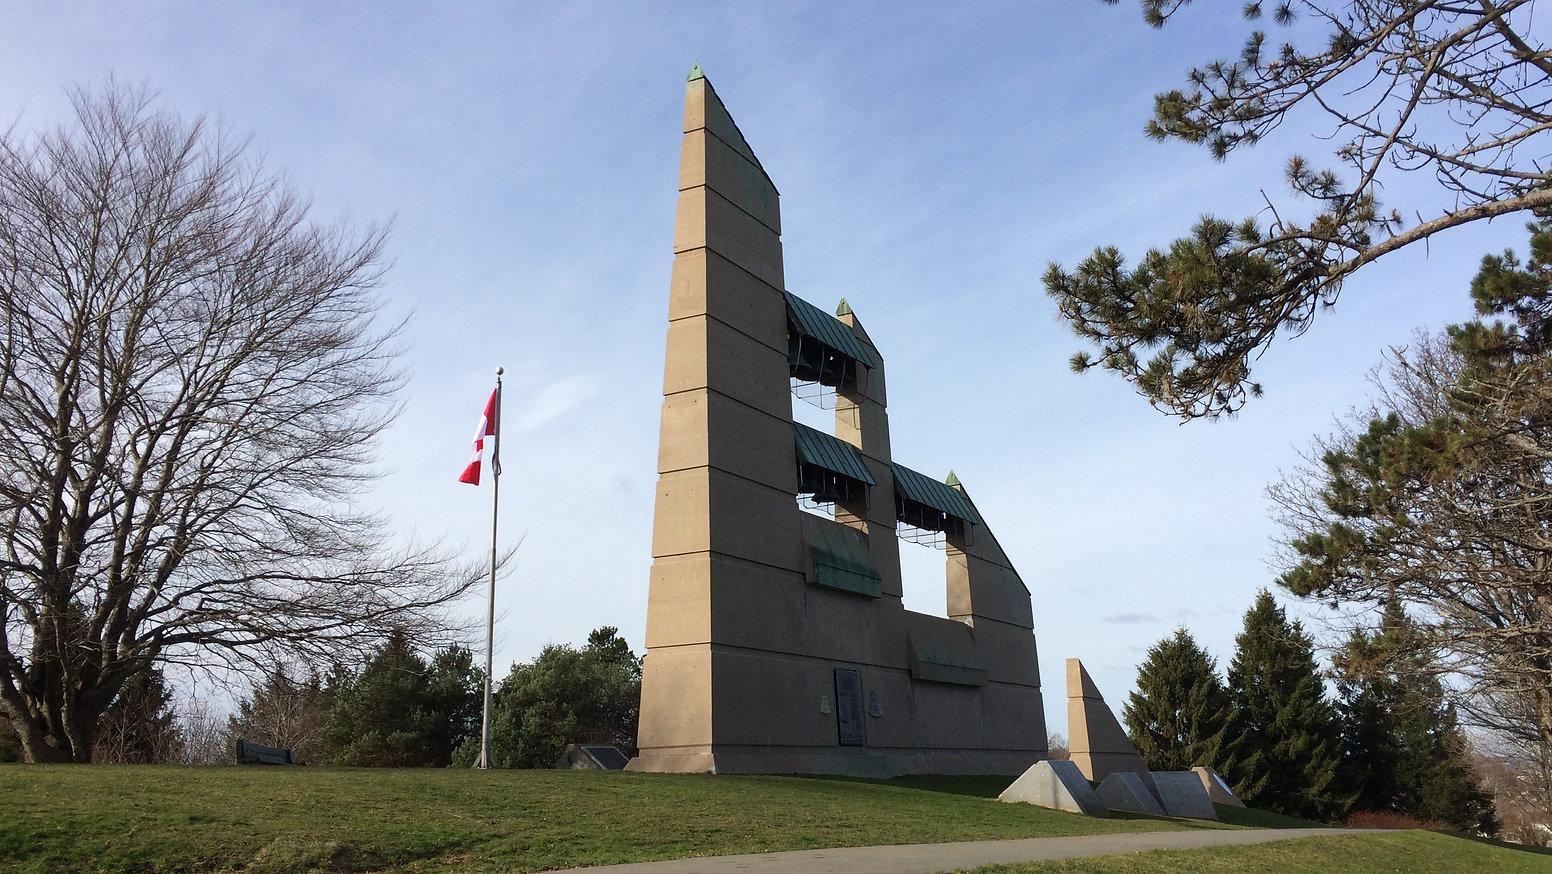 memorial bell tower Halifax audio walking tour